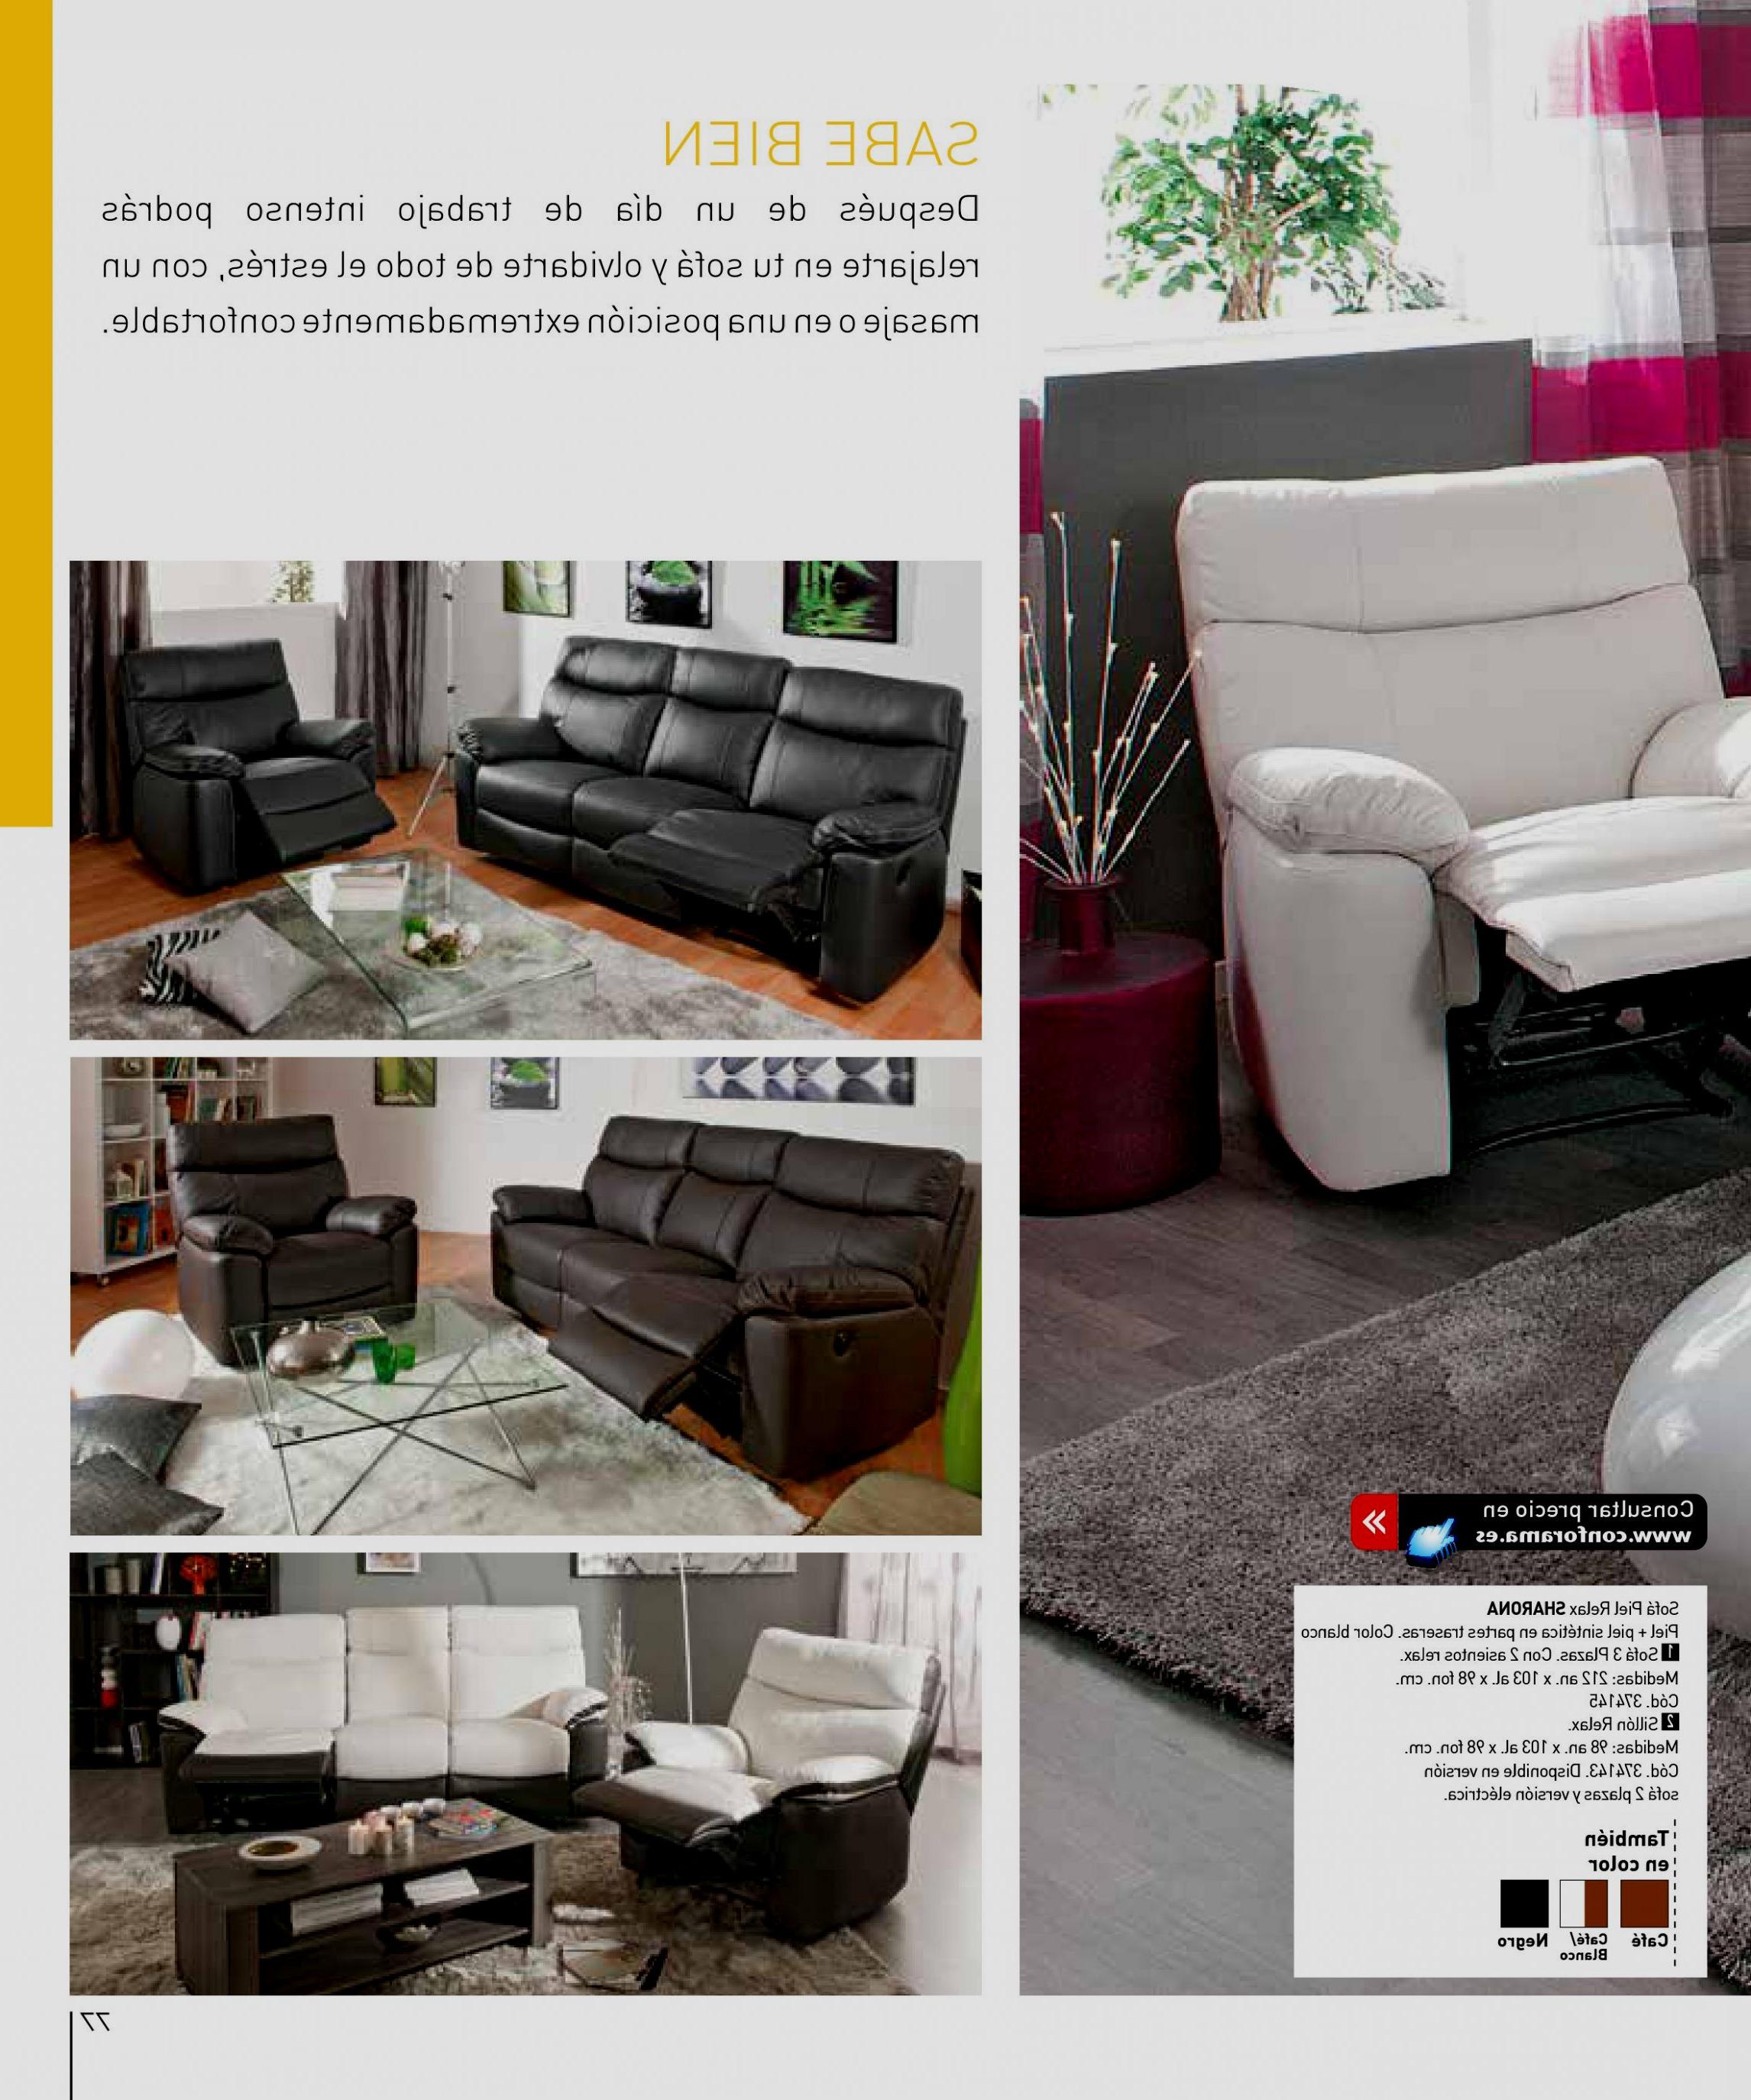 Sofa 2 Plazas Conforama Mndw Sillon Relax Electrico Merkamueble Agradable sofa 2 Plazas Conforama